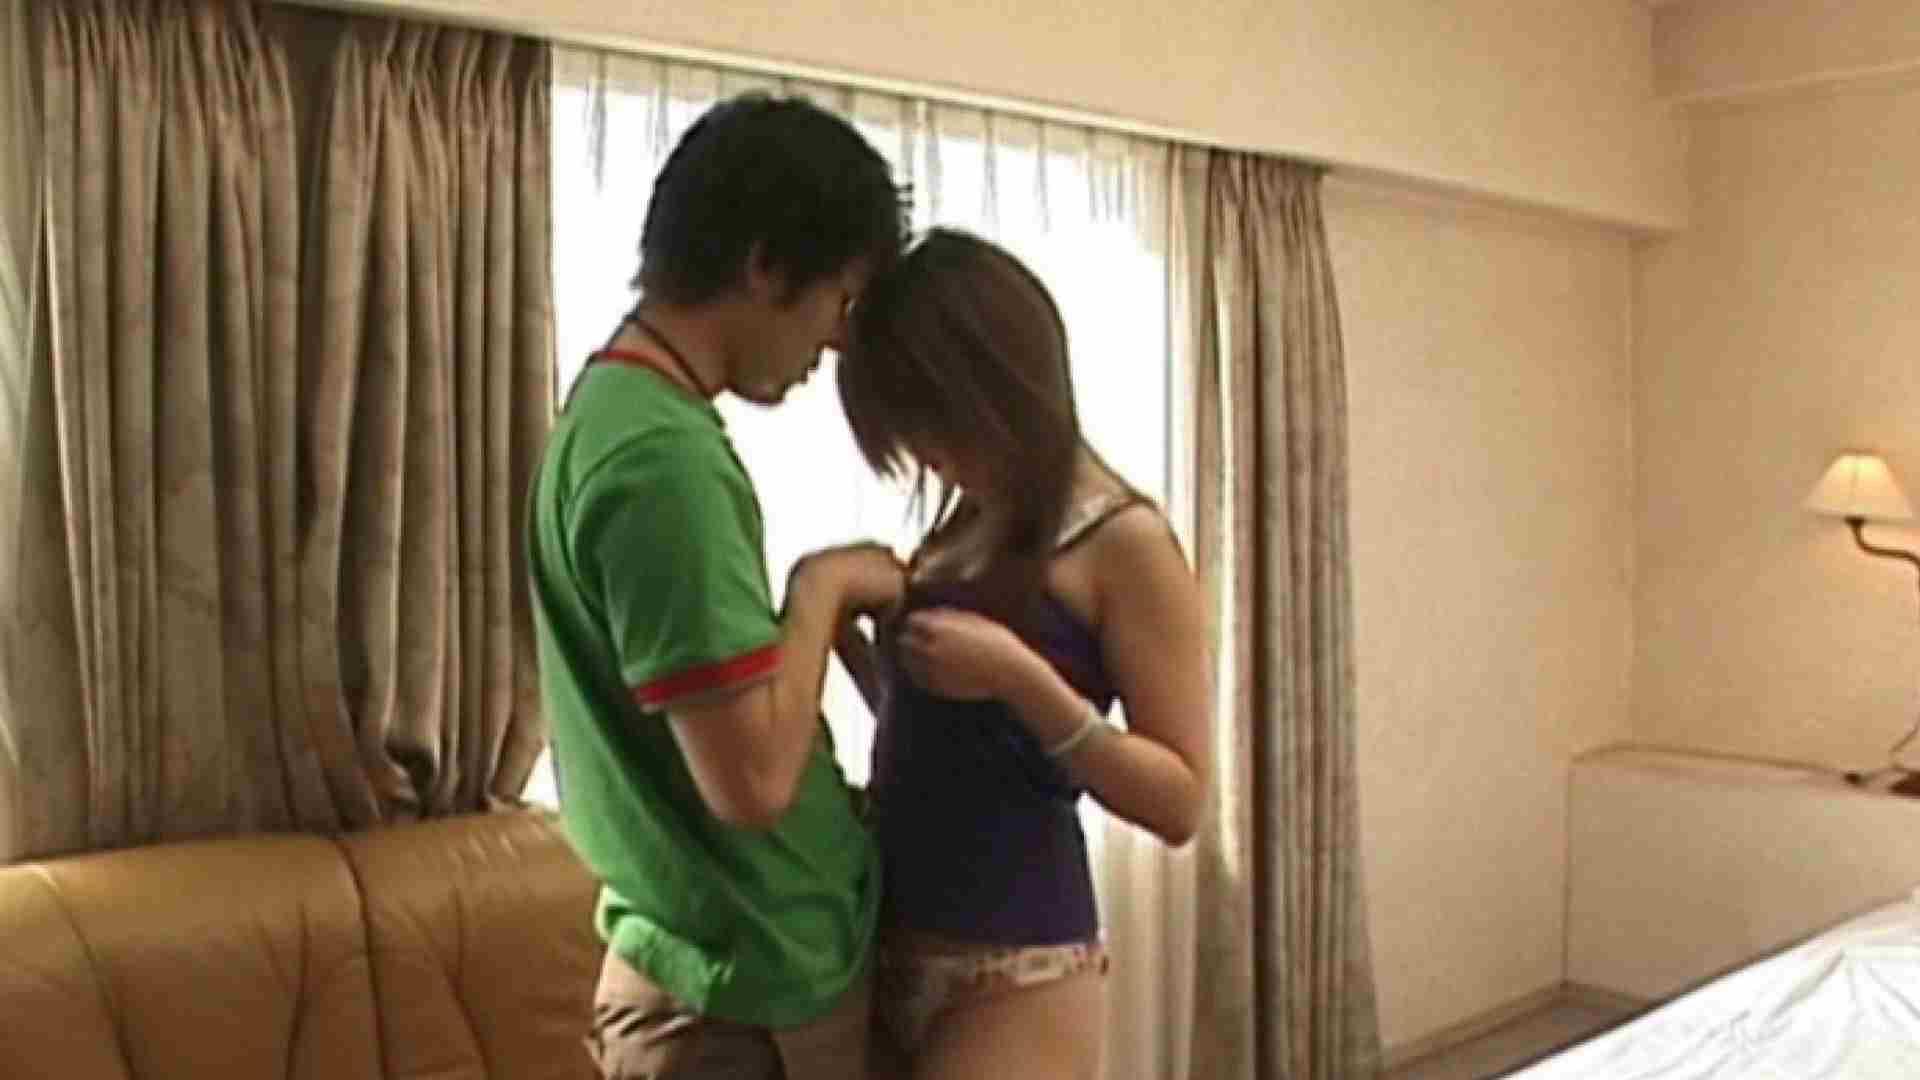 S級厳選美女ビッチガールVol.53 美女丸裸  100pic 45